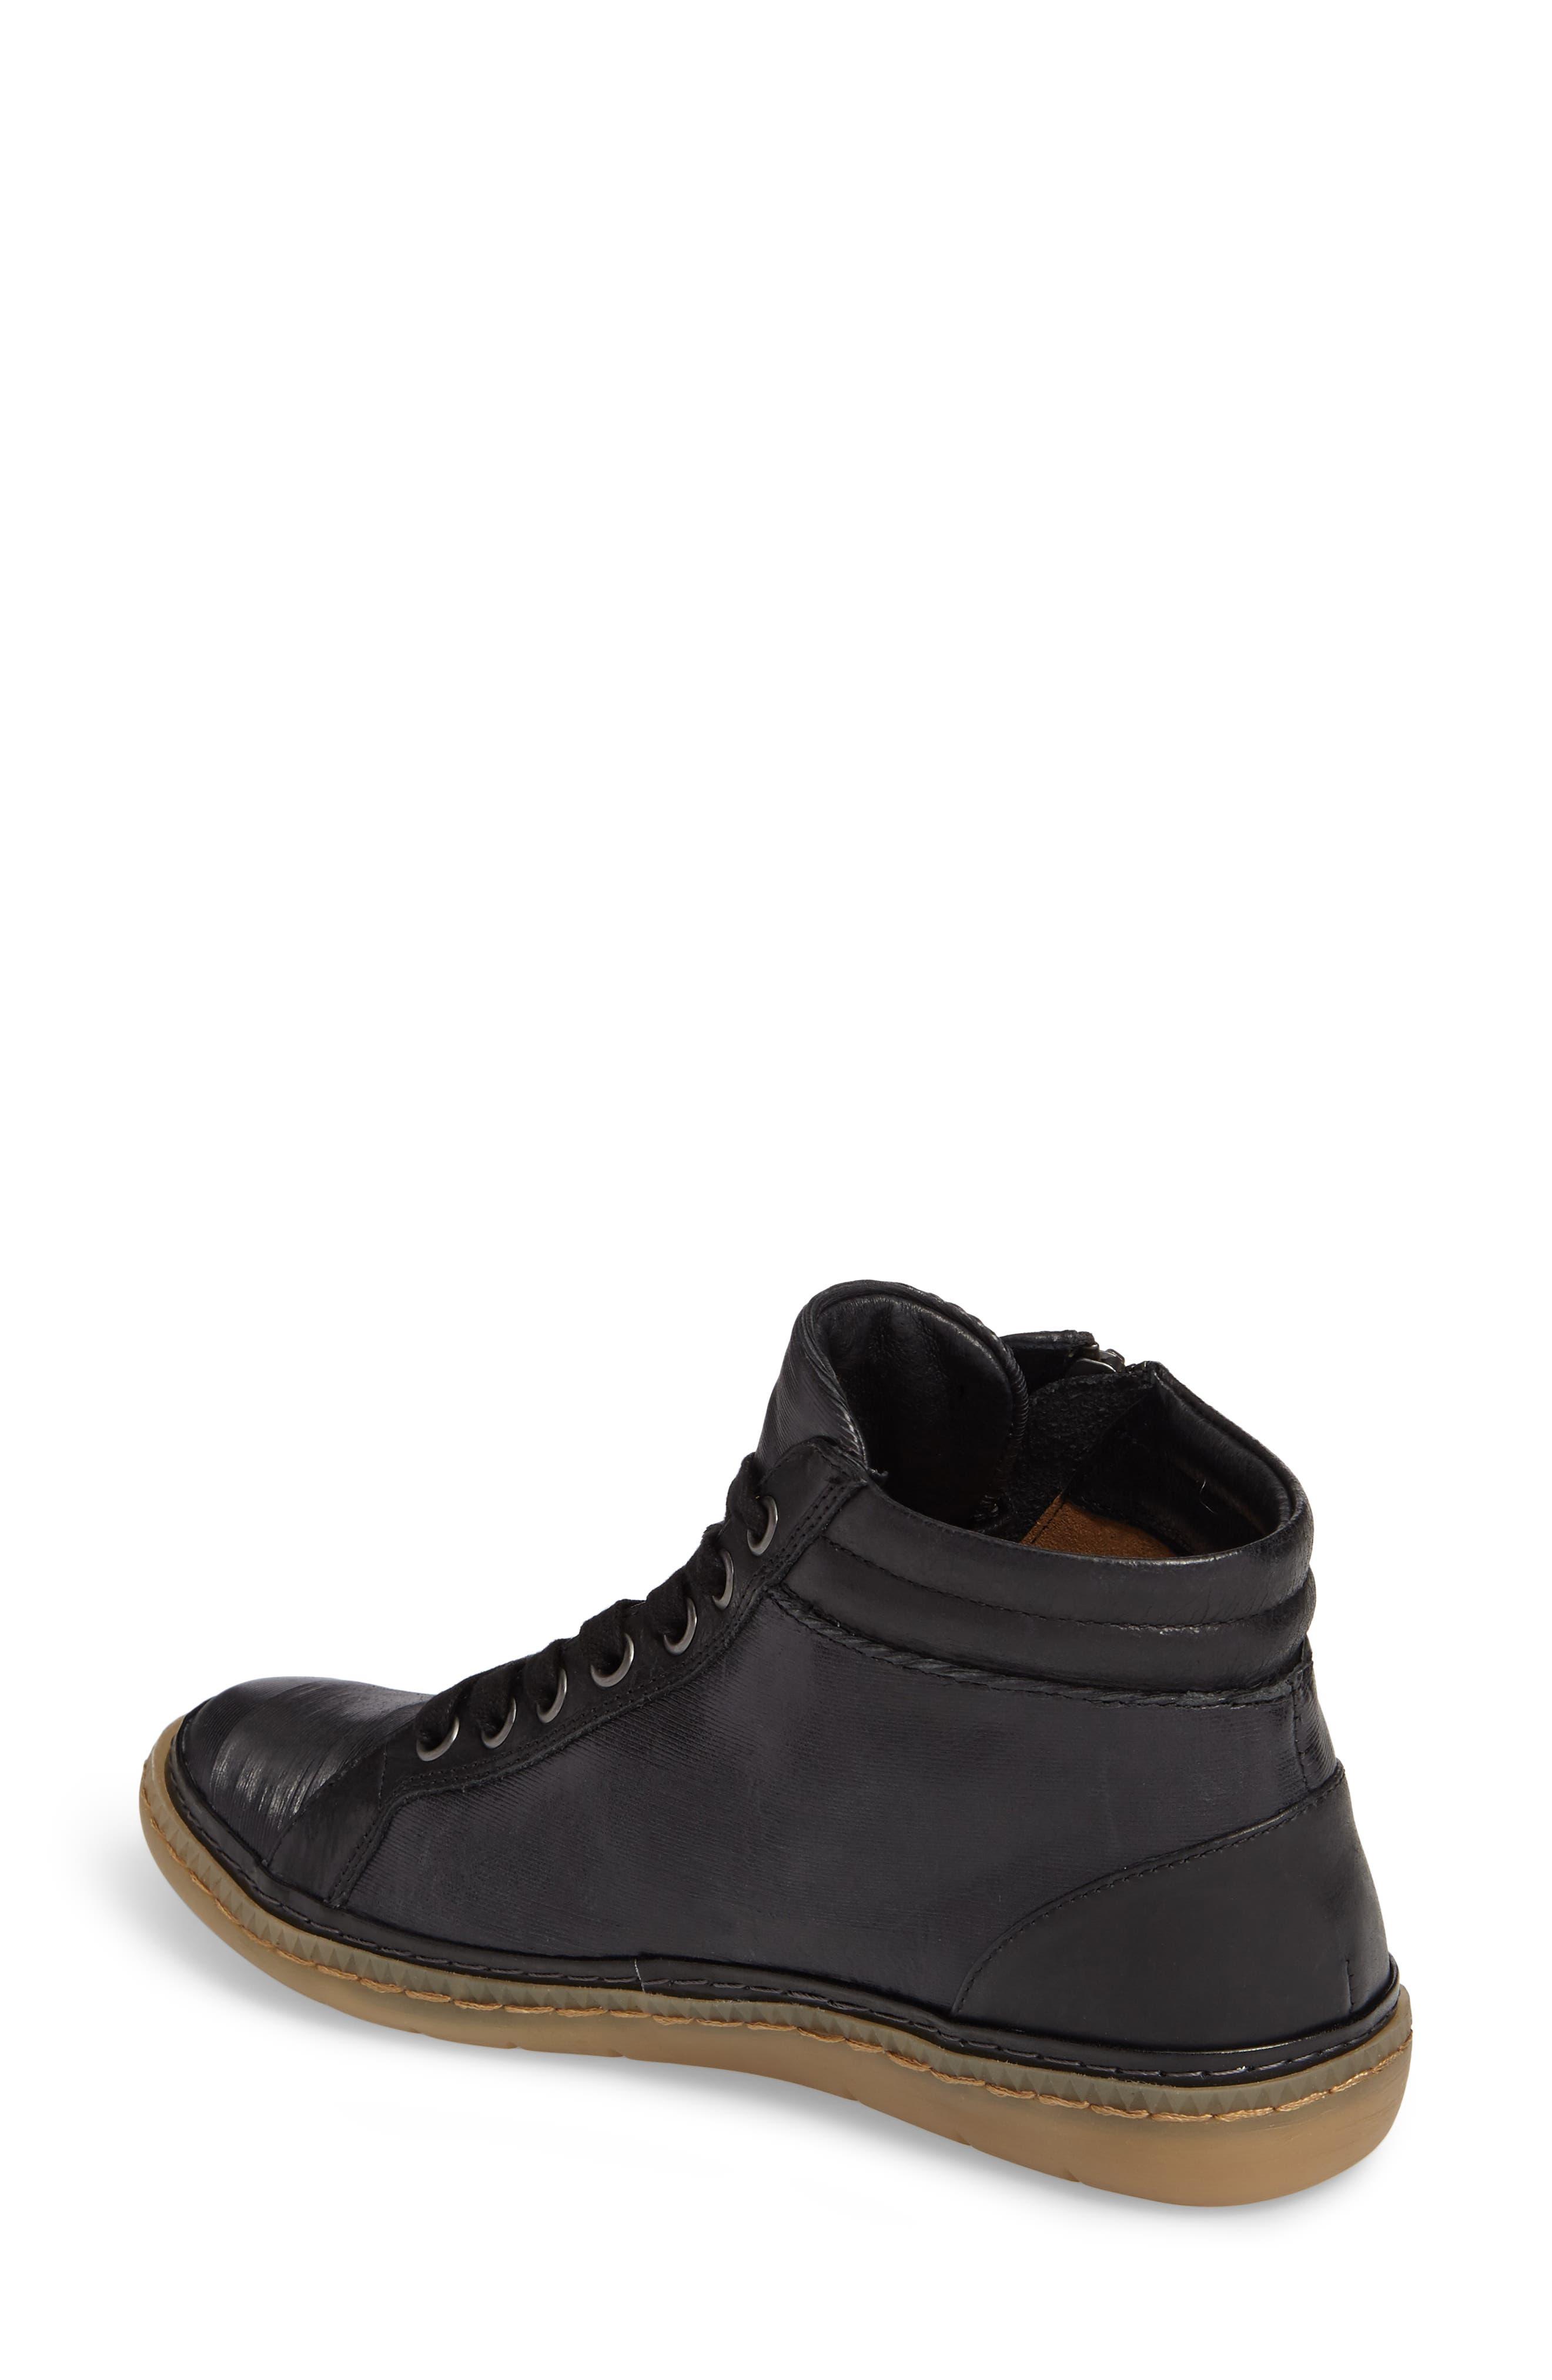 Annaleigh High Top Sneaker,                             Alternate thumbnail 2, color,                             001